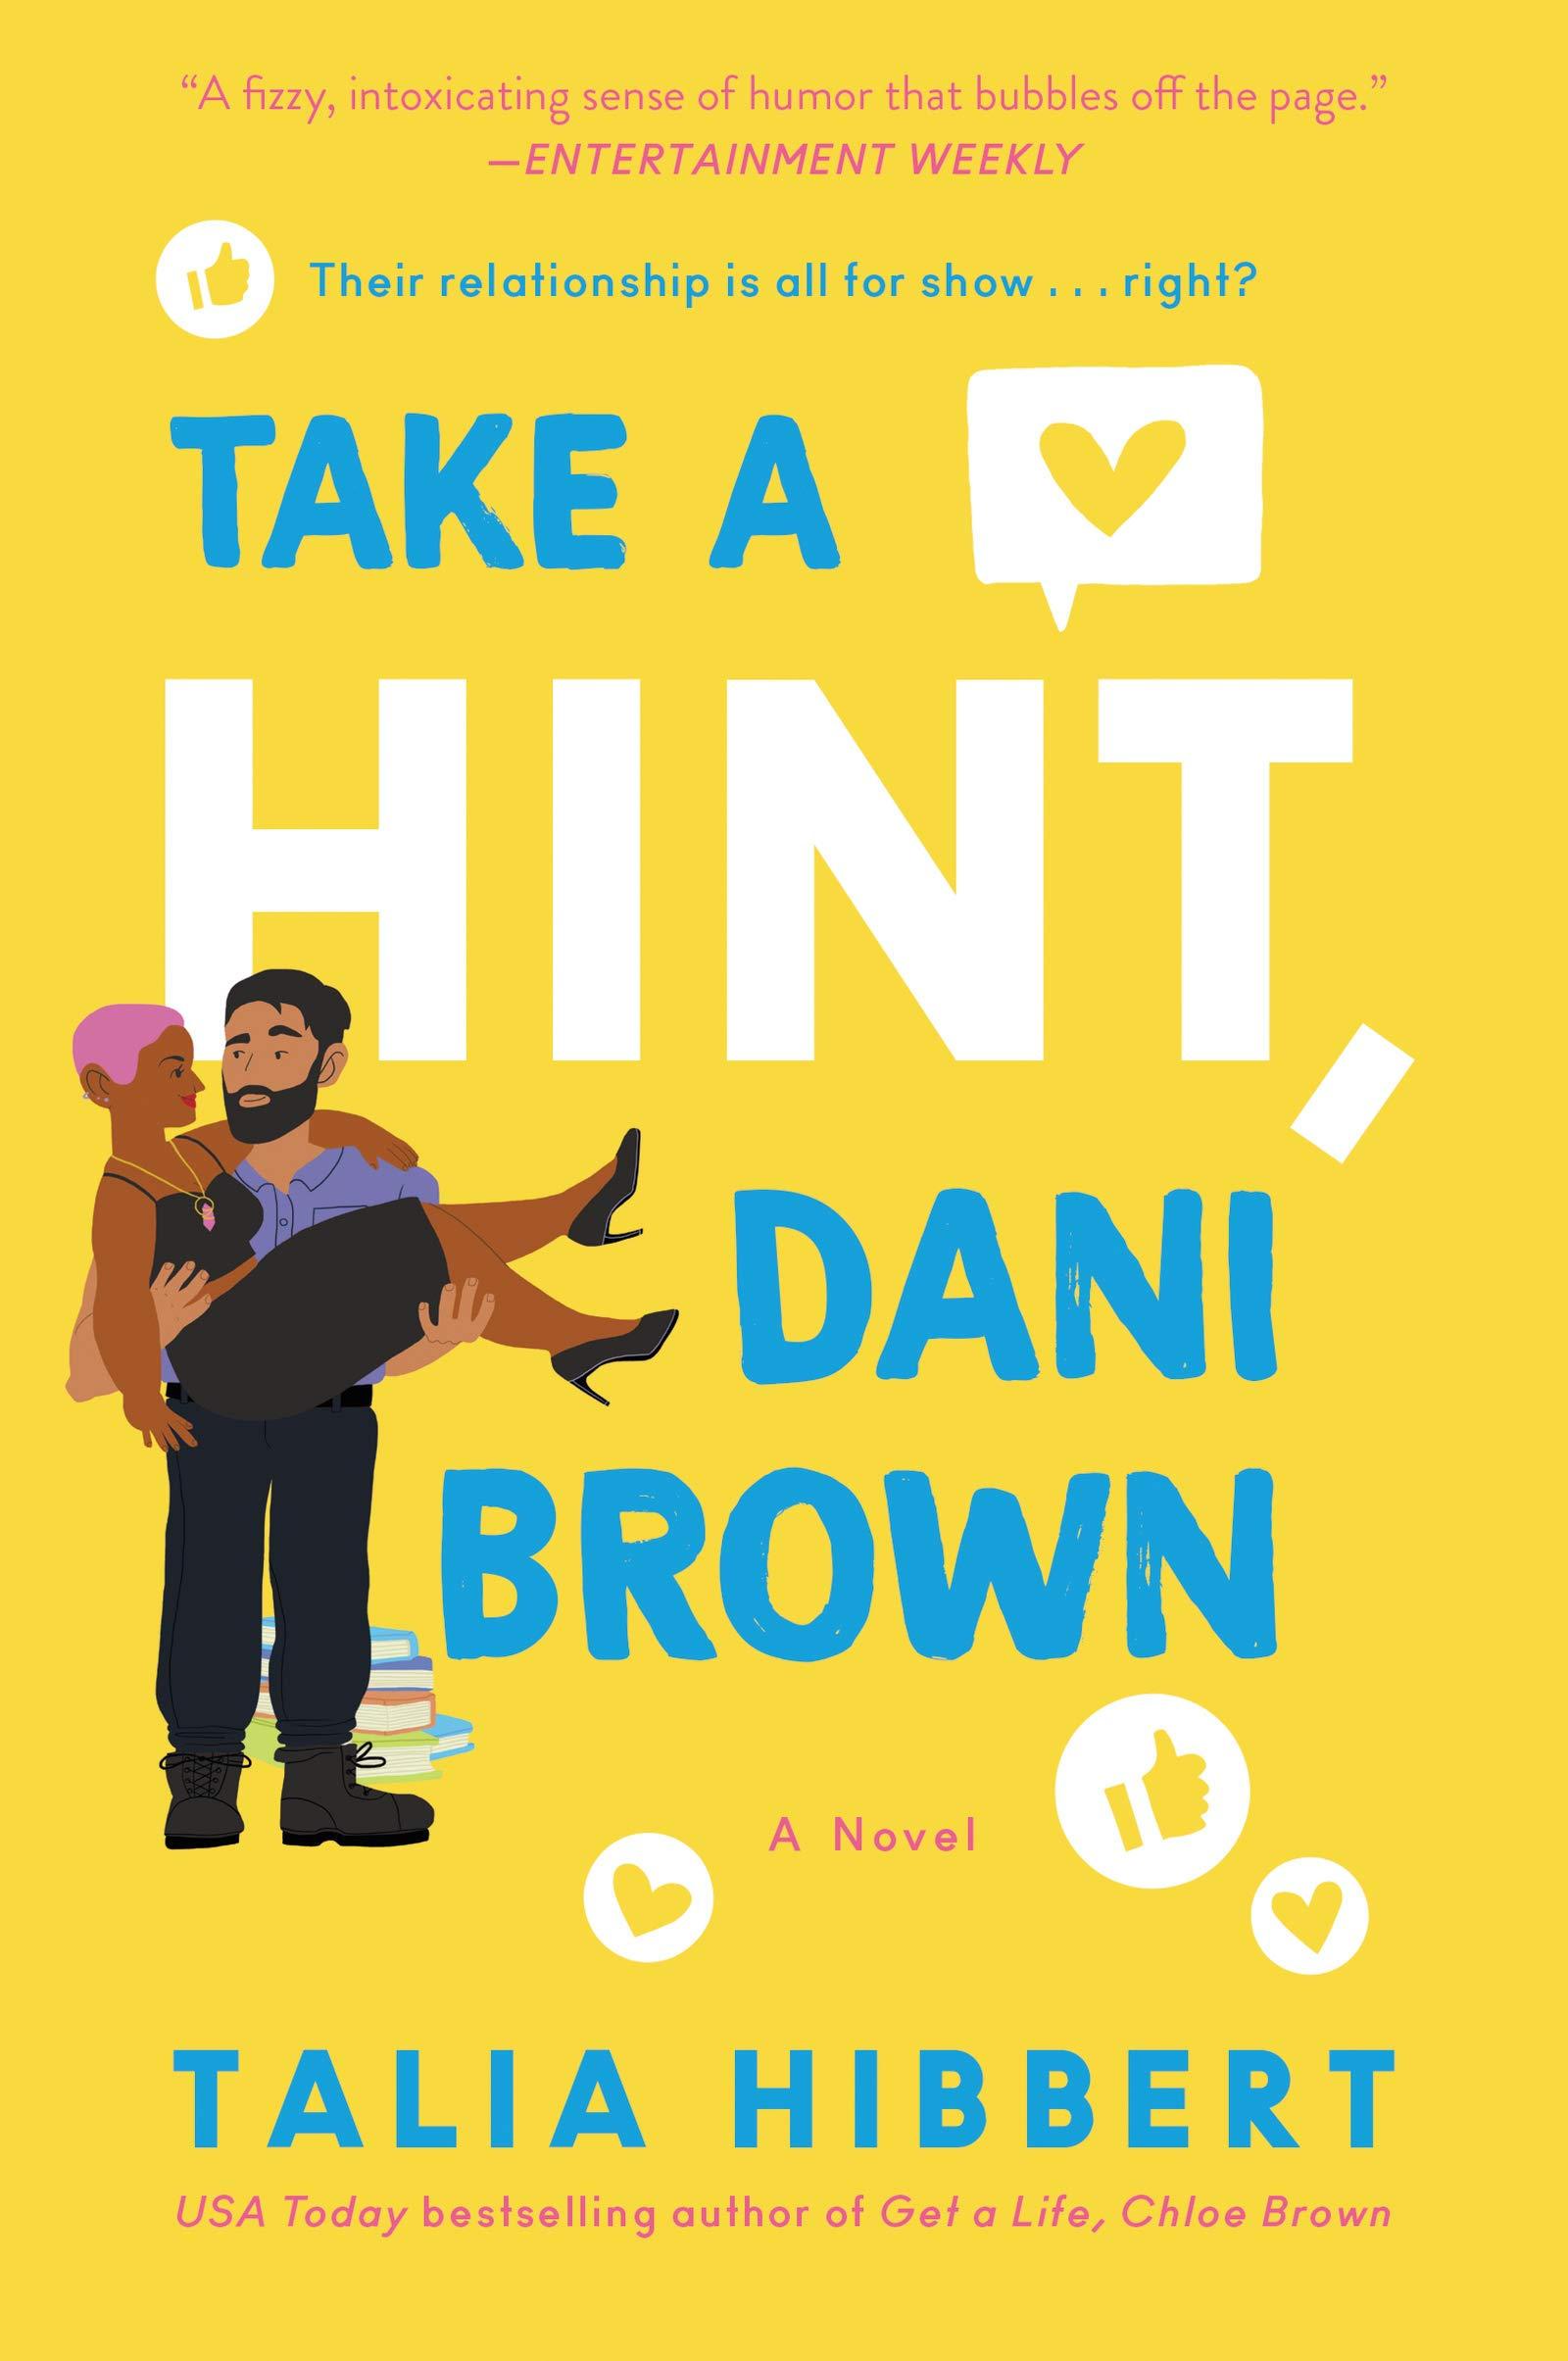 Take a Hint Dani Brown by Talia Hibbert